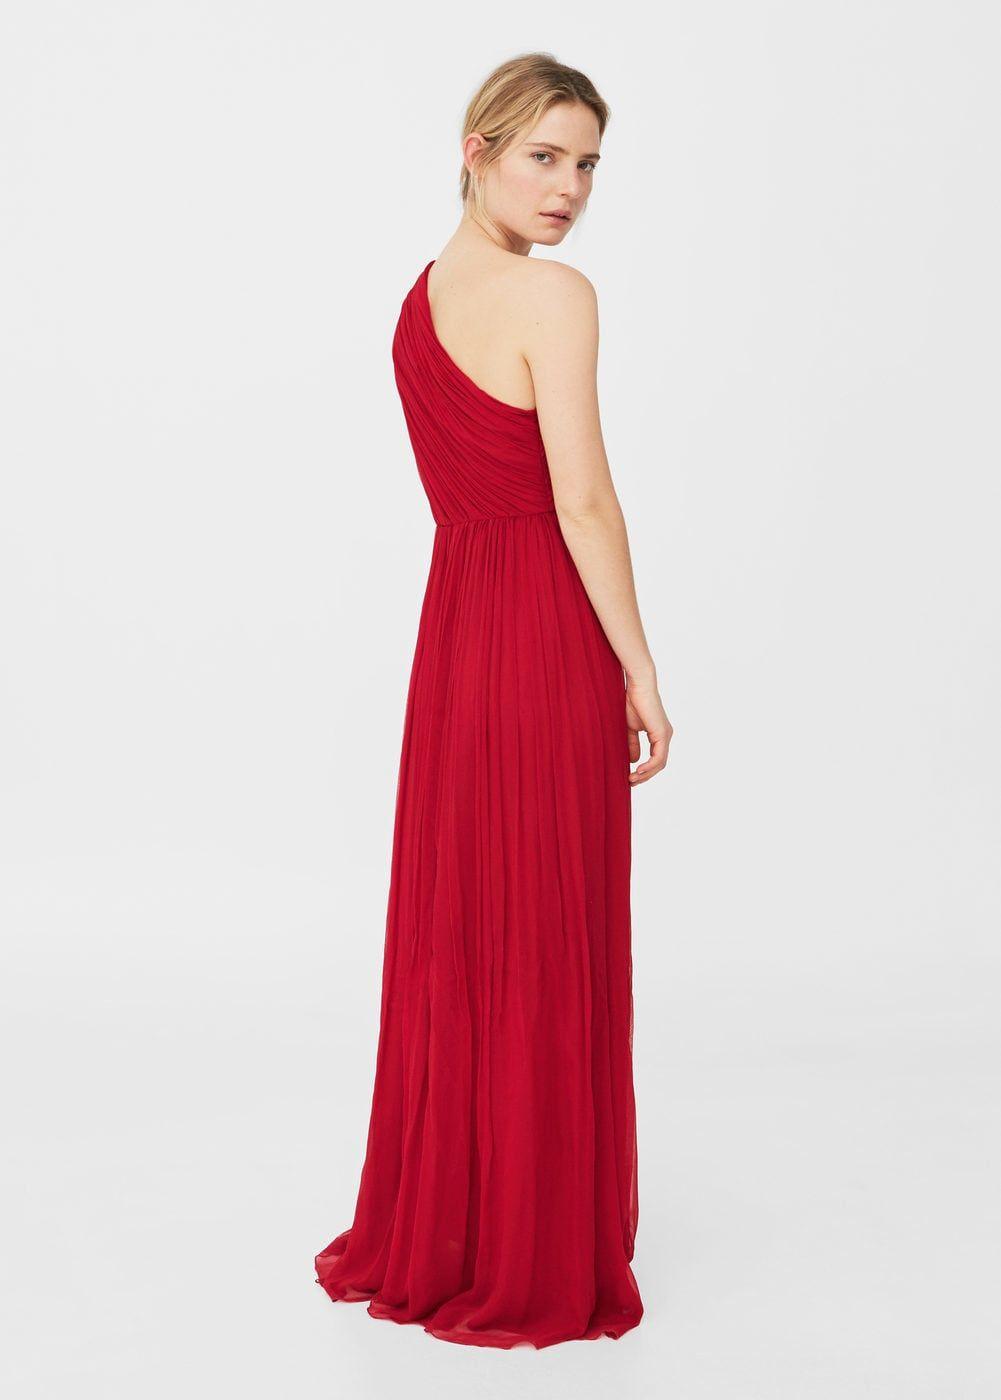 Asymetrické hedvábné šaty - Žena  ced6af5f047